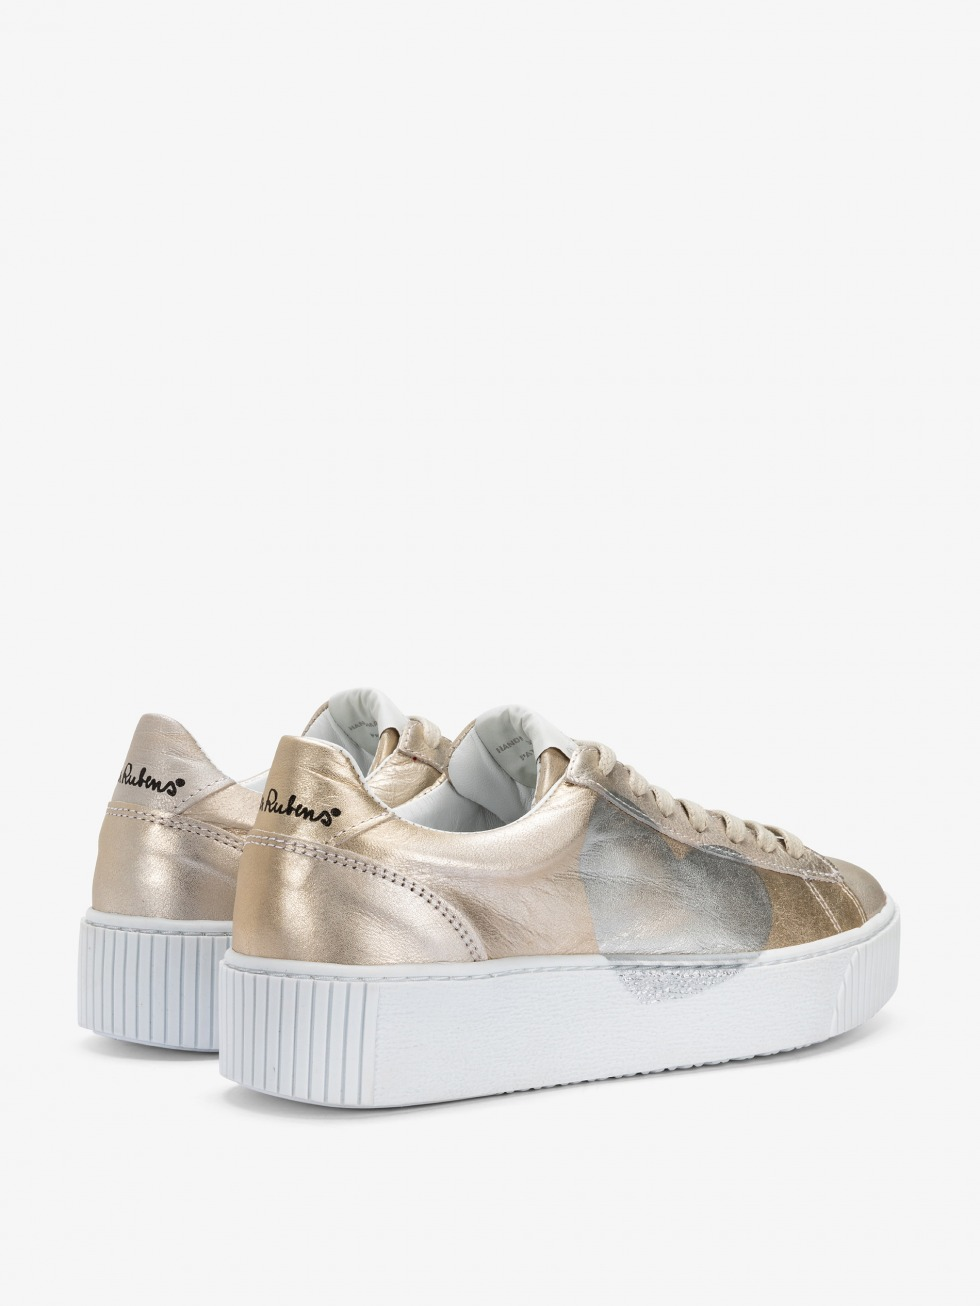 Sneakers Cosmopolitan Cometa - Cuore